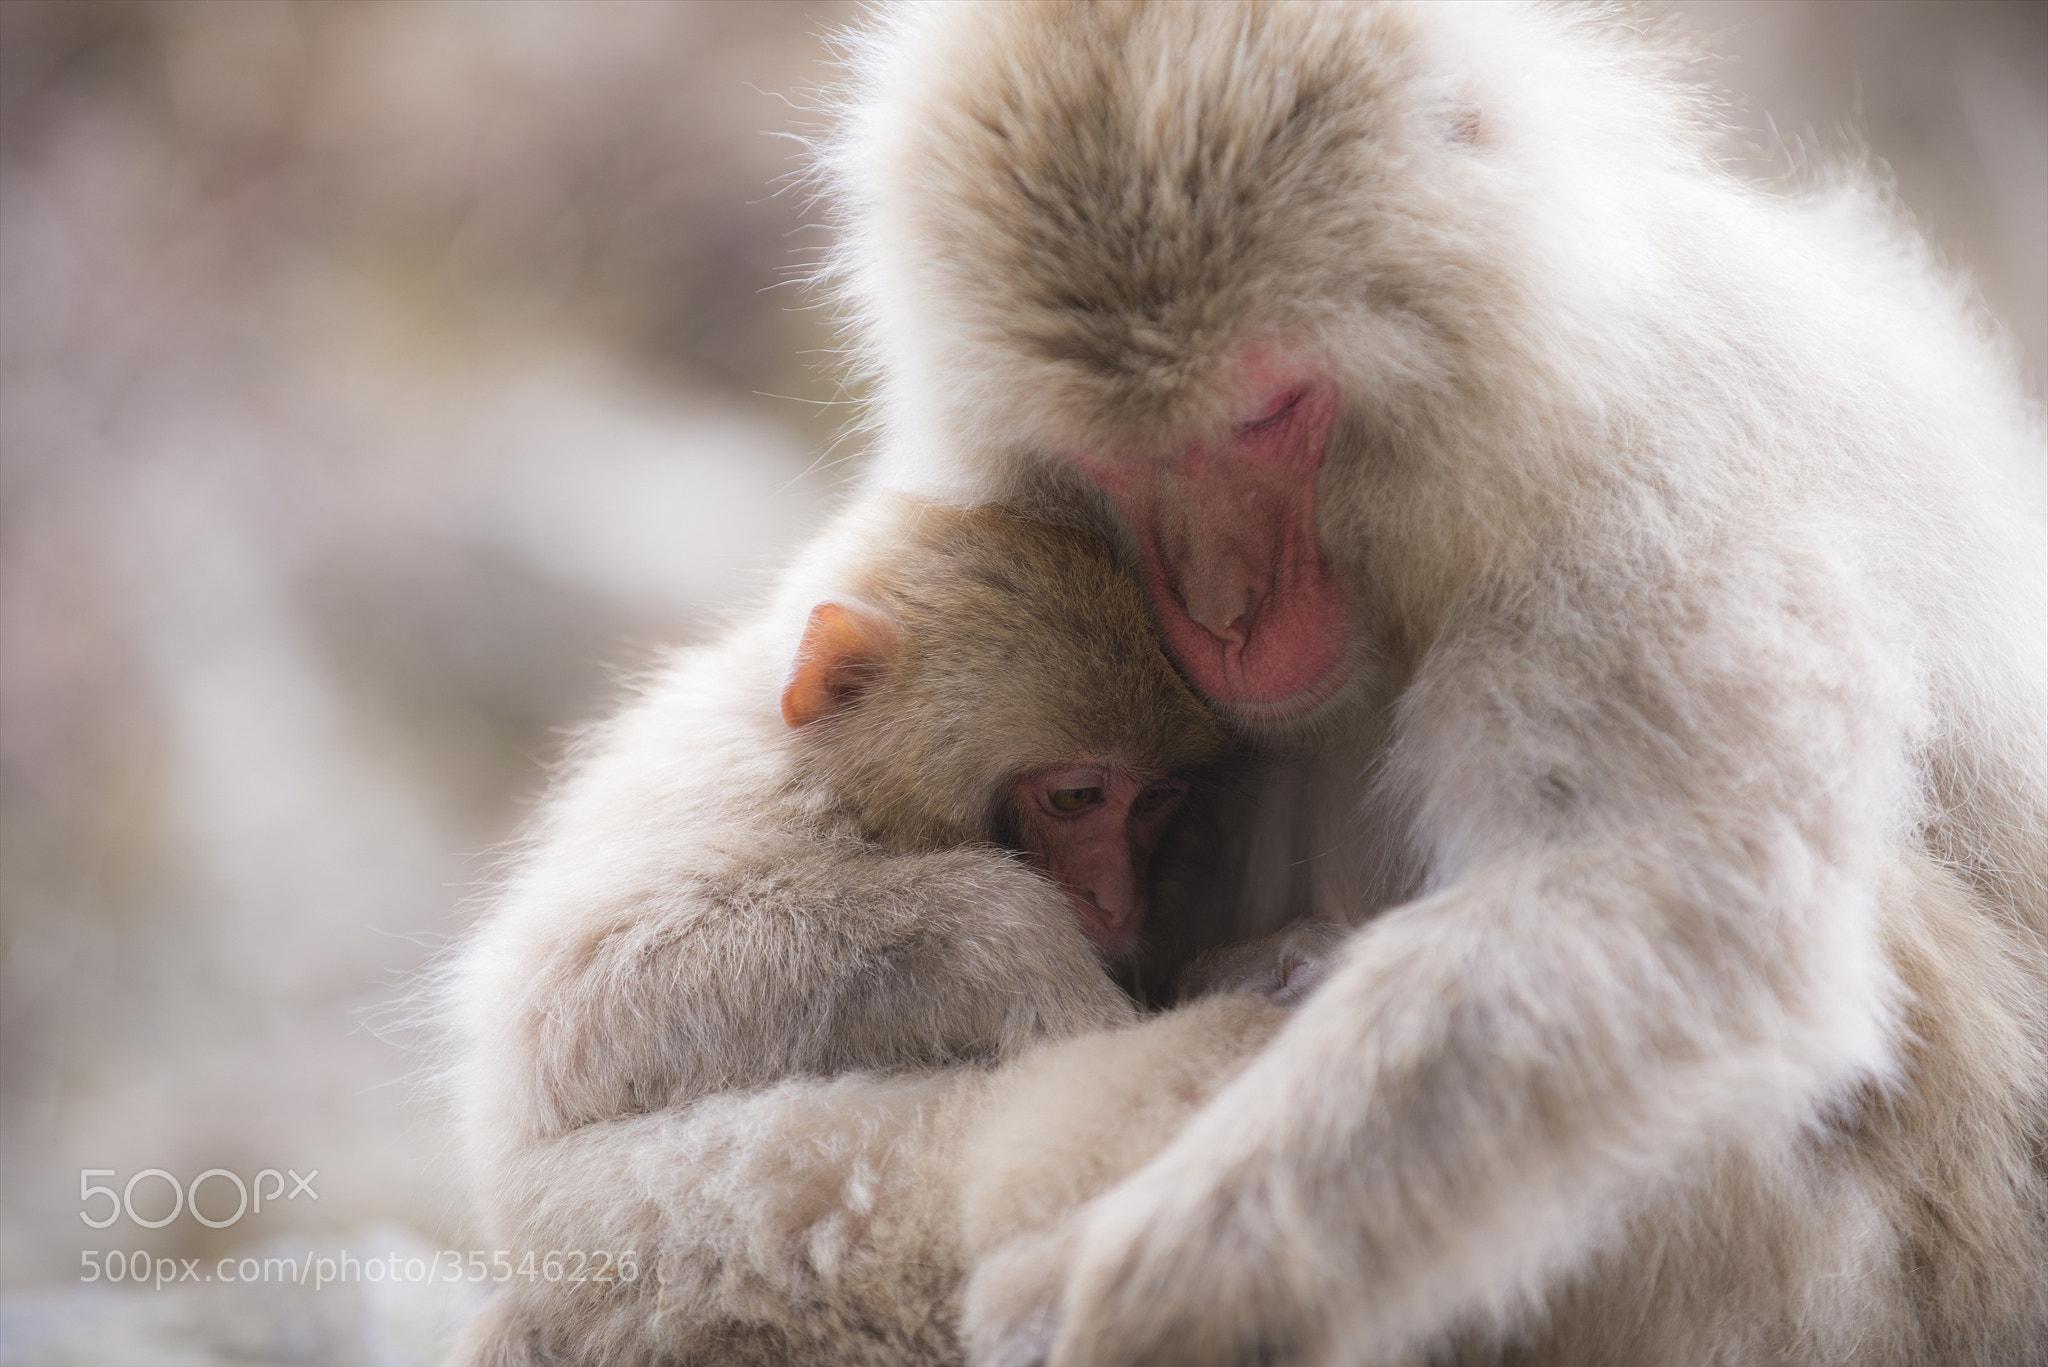 Photograph Give me a Hug by hugh dornan on 500px